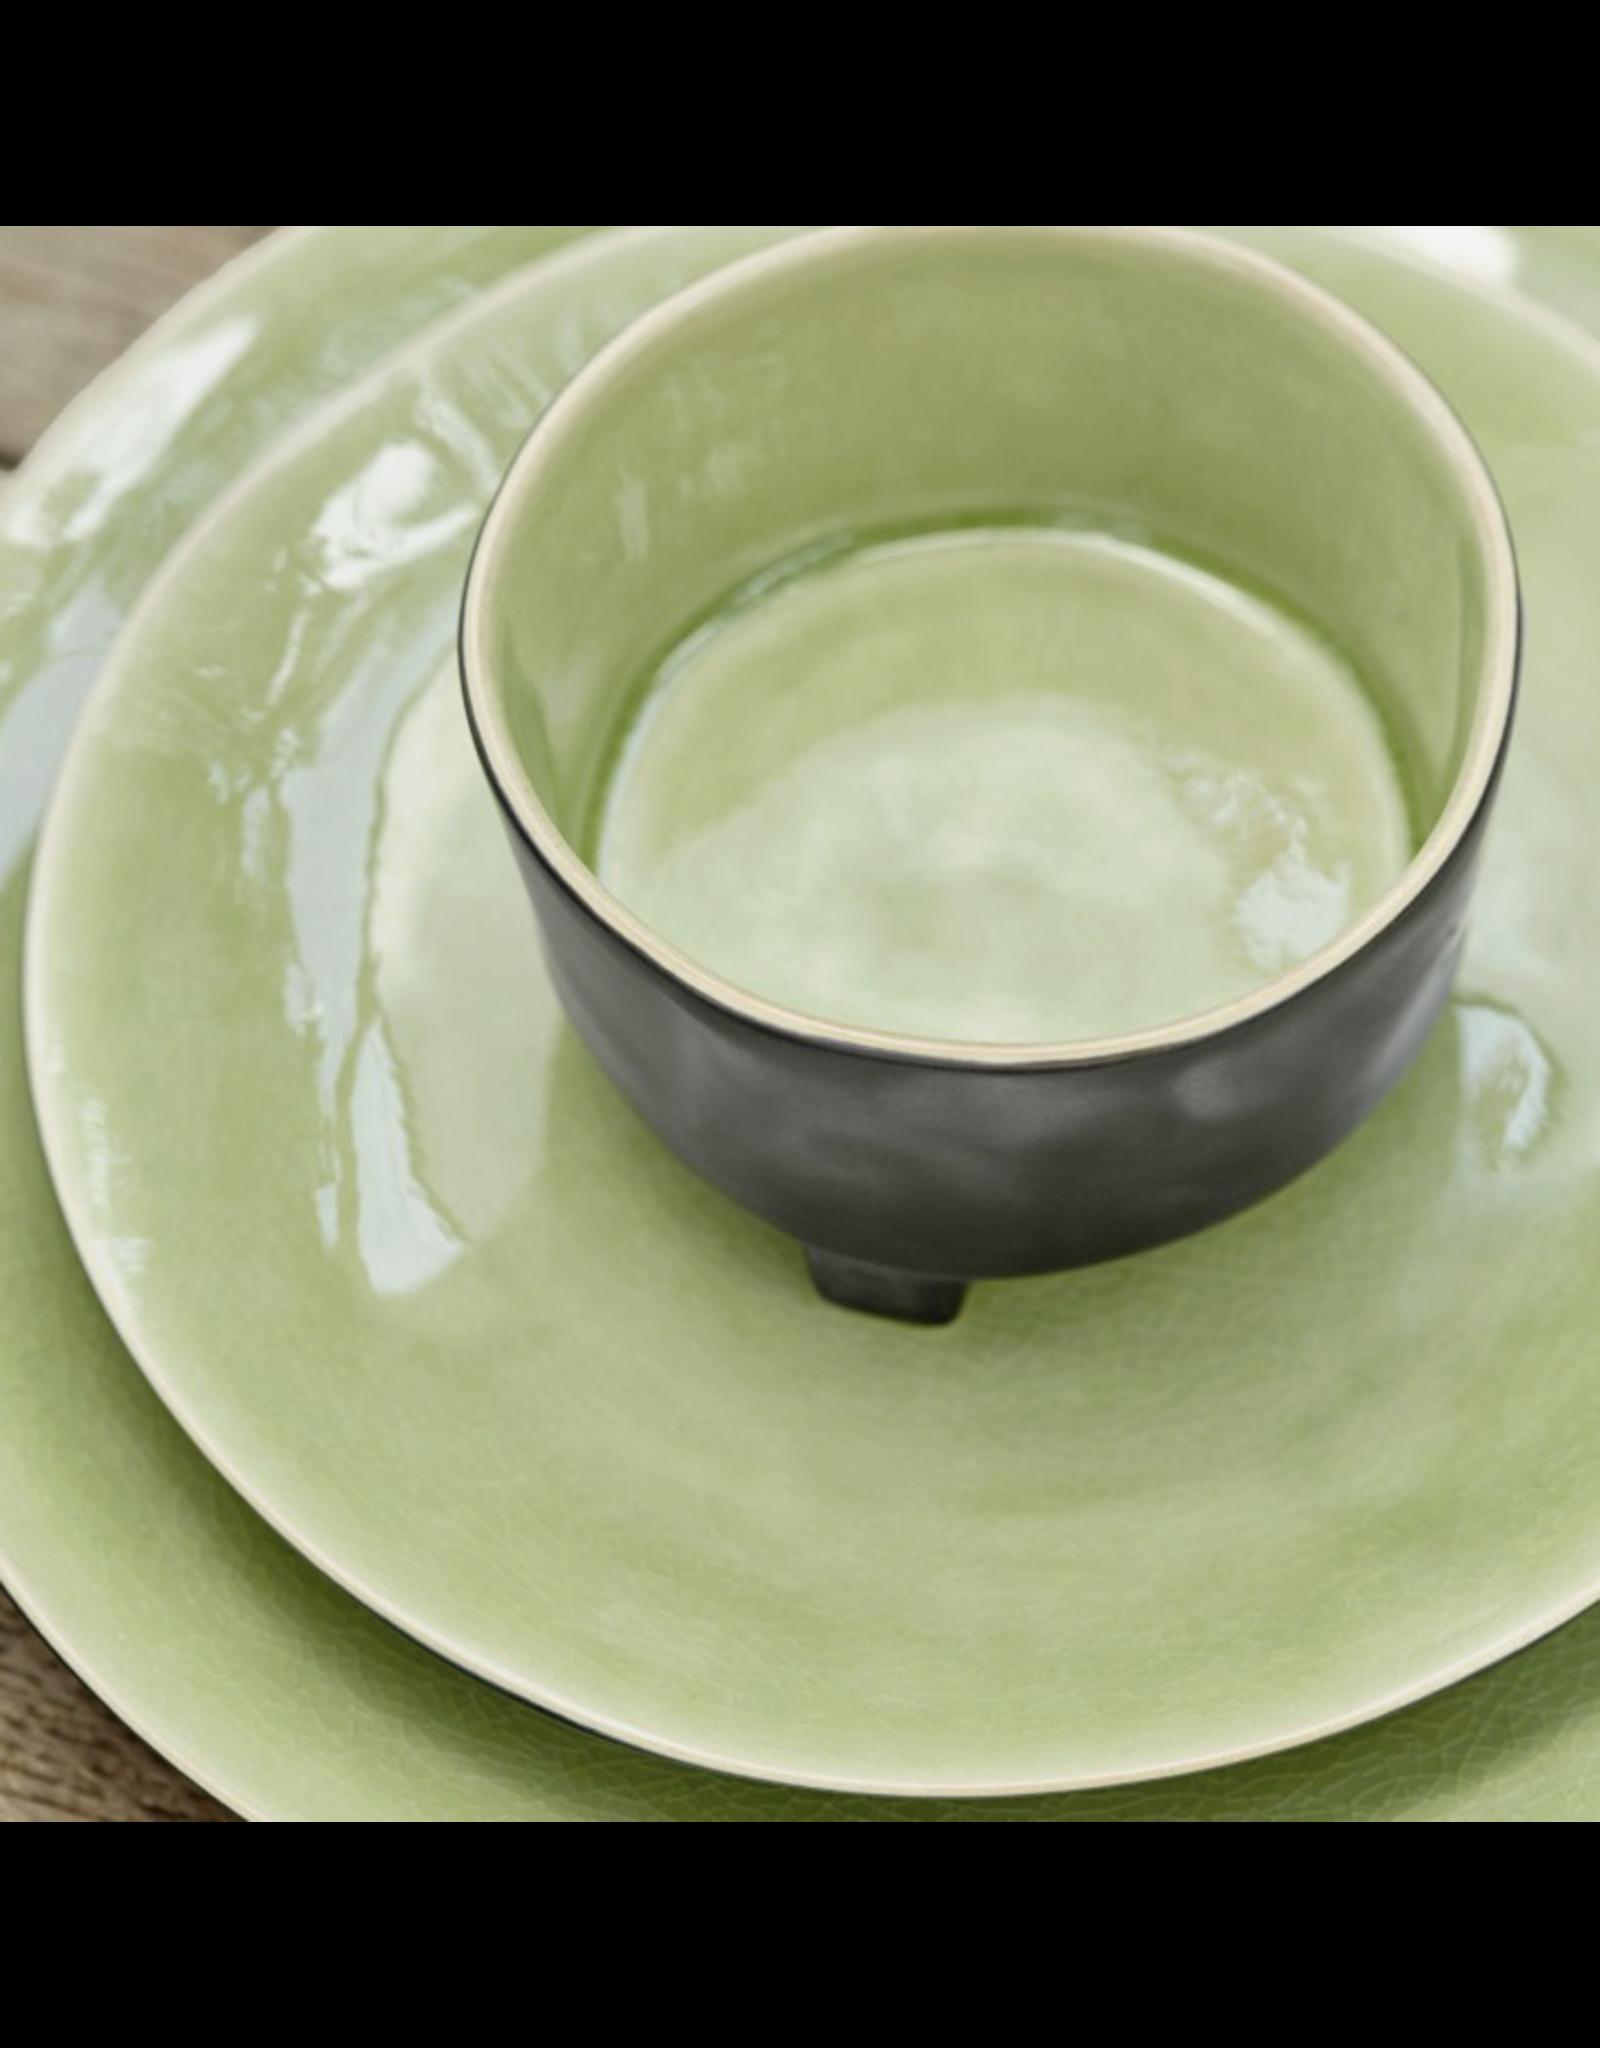 Kitchen Trend Bakje op voet klein riviera vert frais